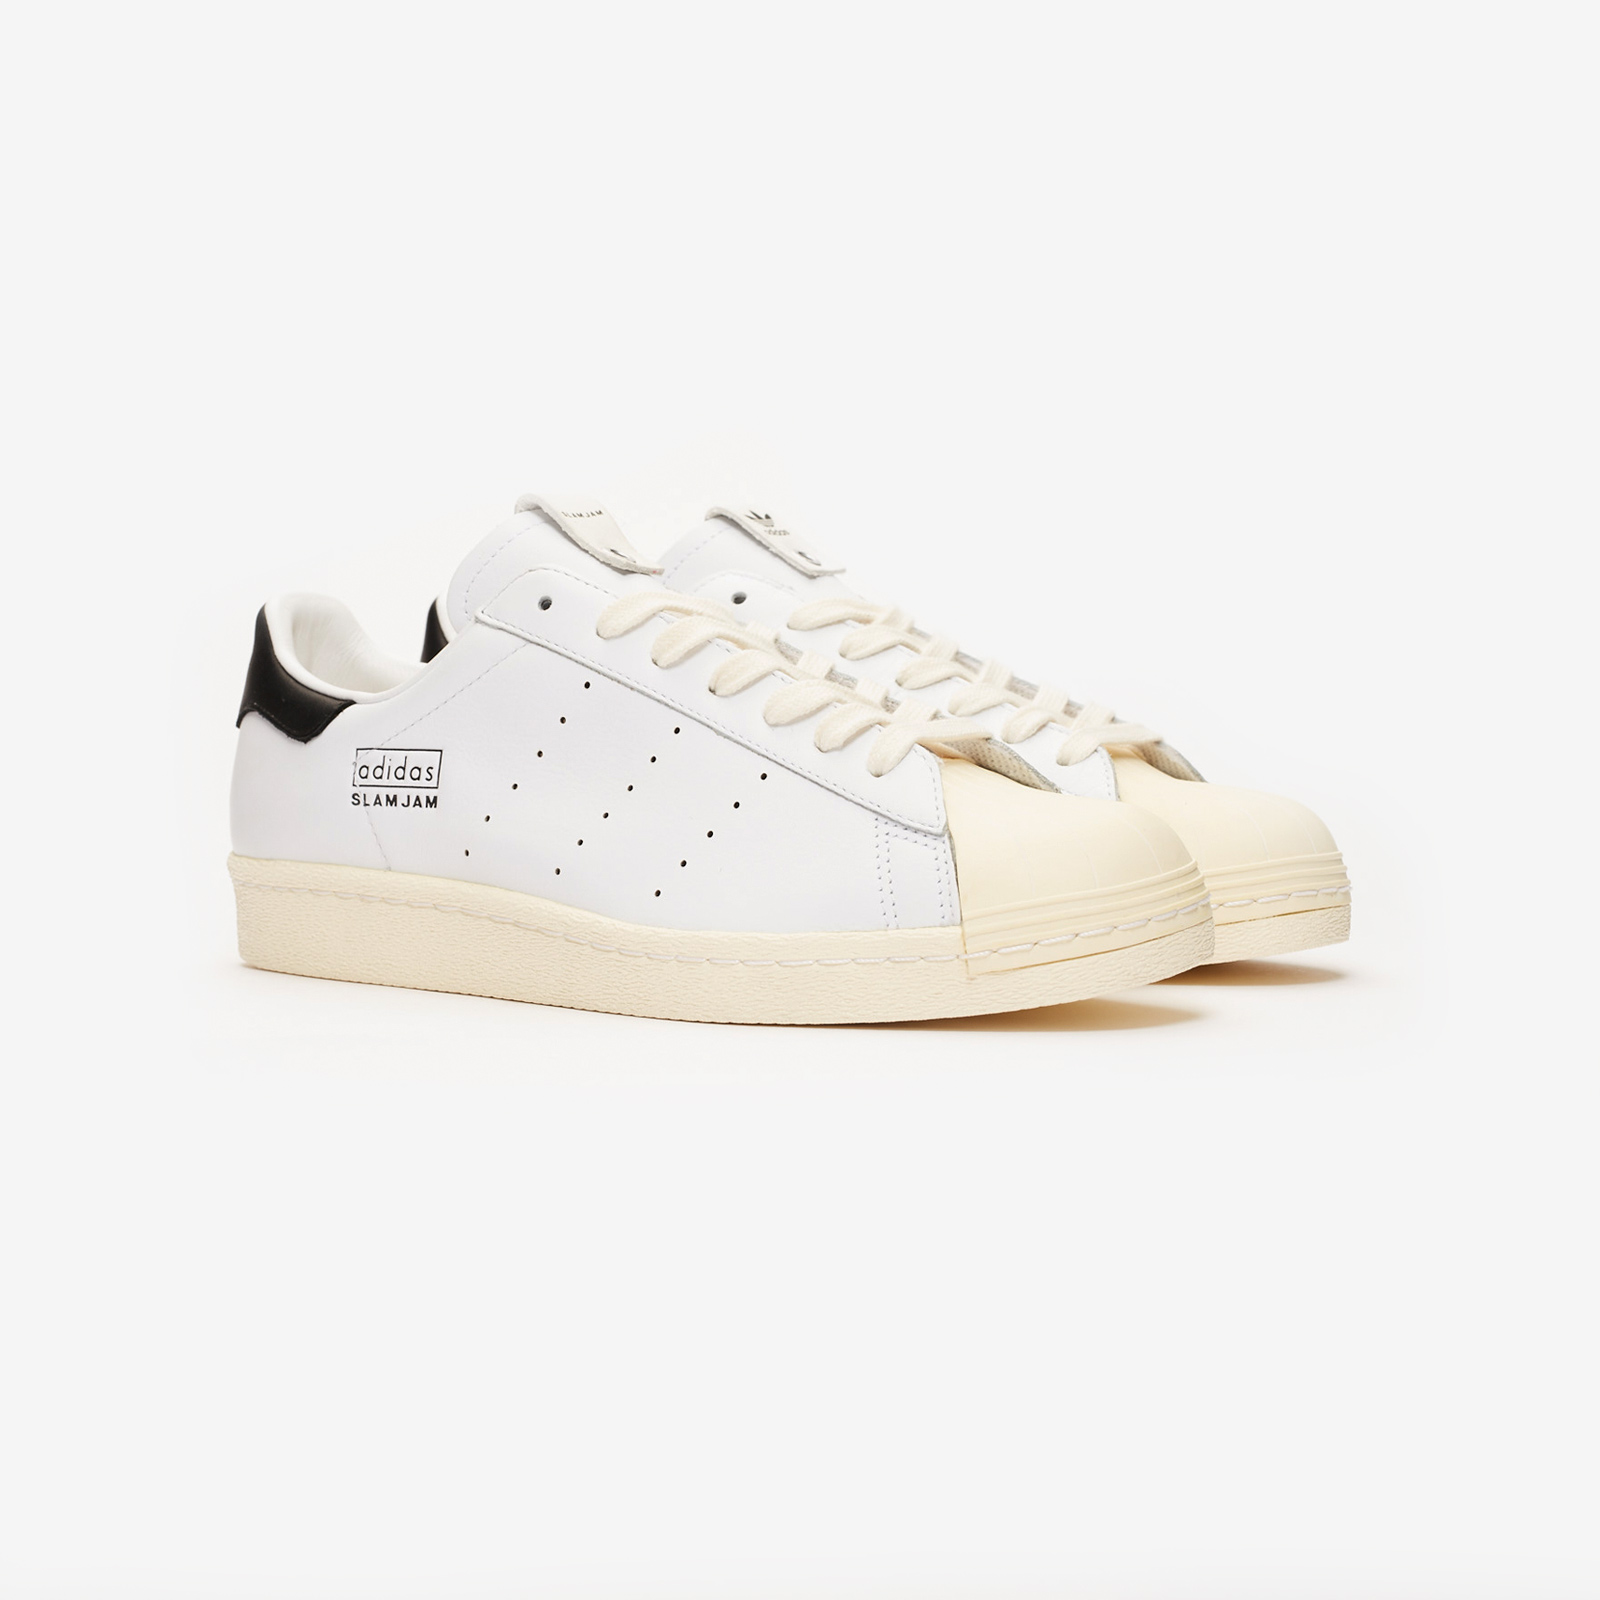 adidas Superstar 80s x Slam Jam